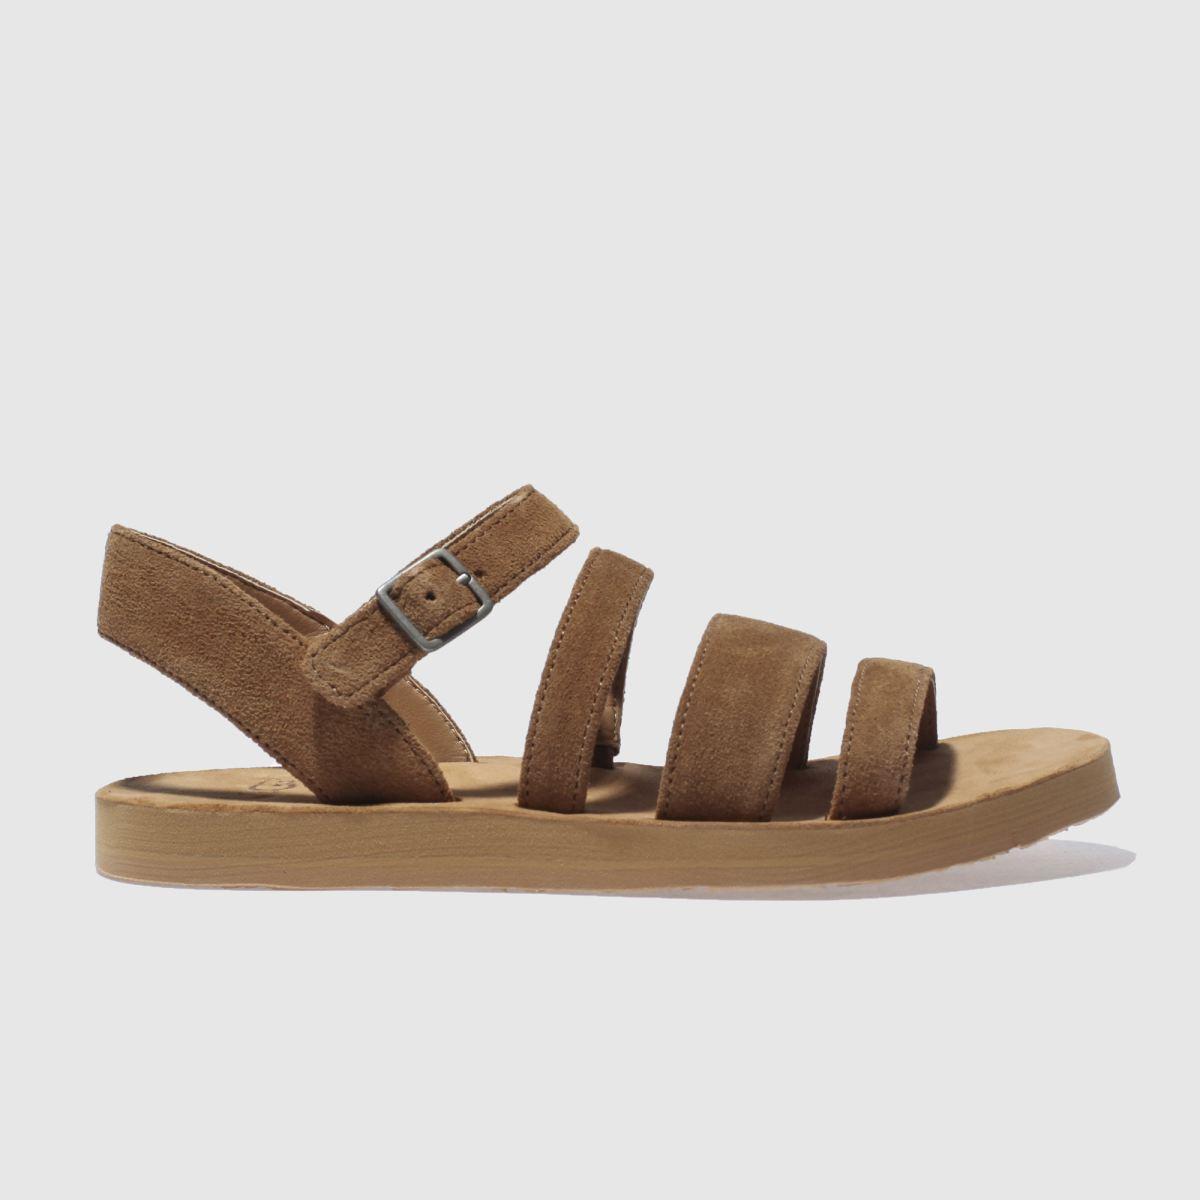 Ugg Tan Alyse Sandals